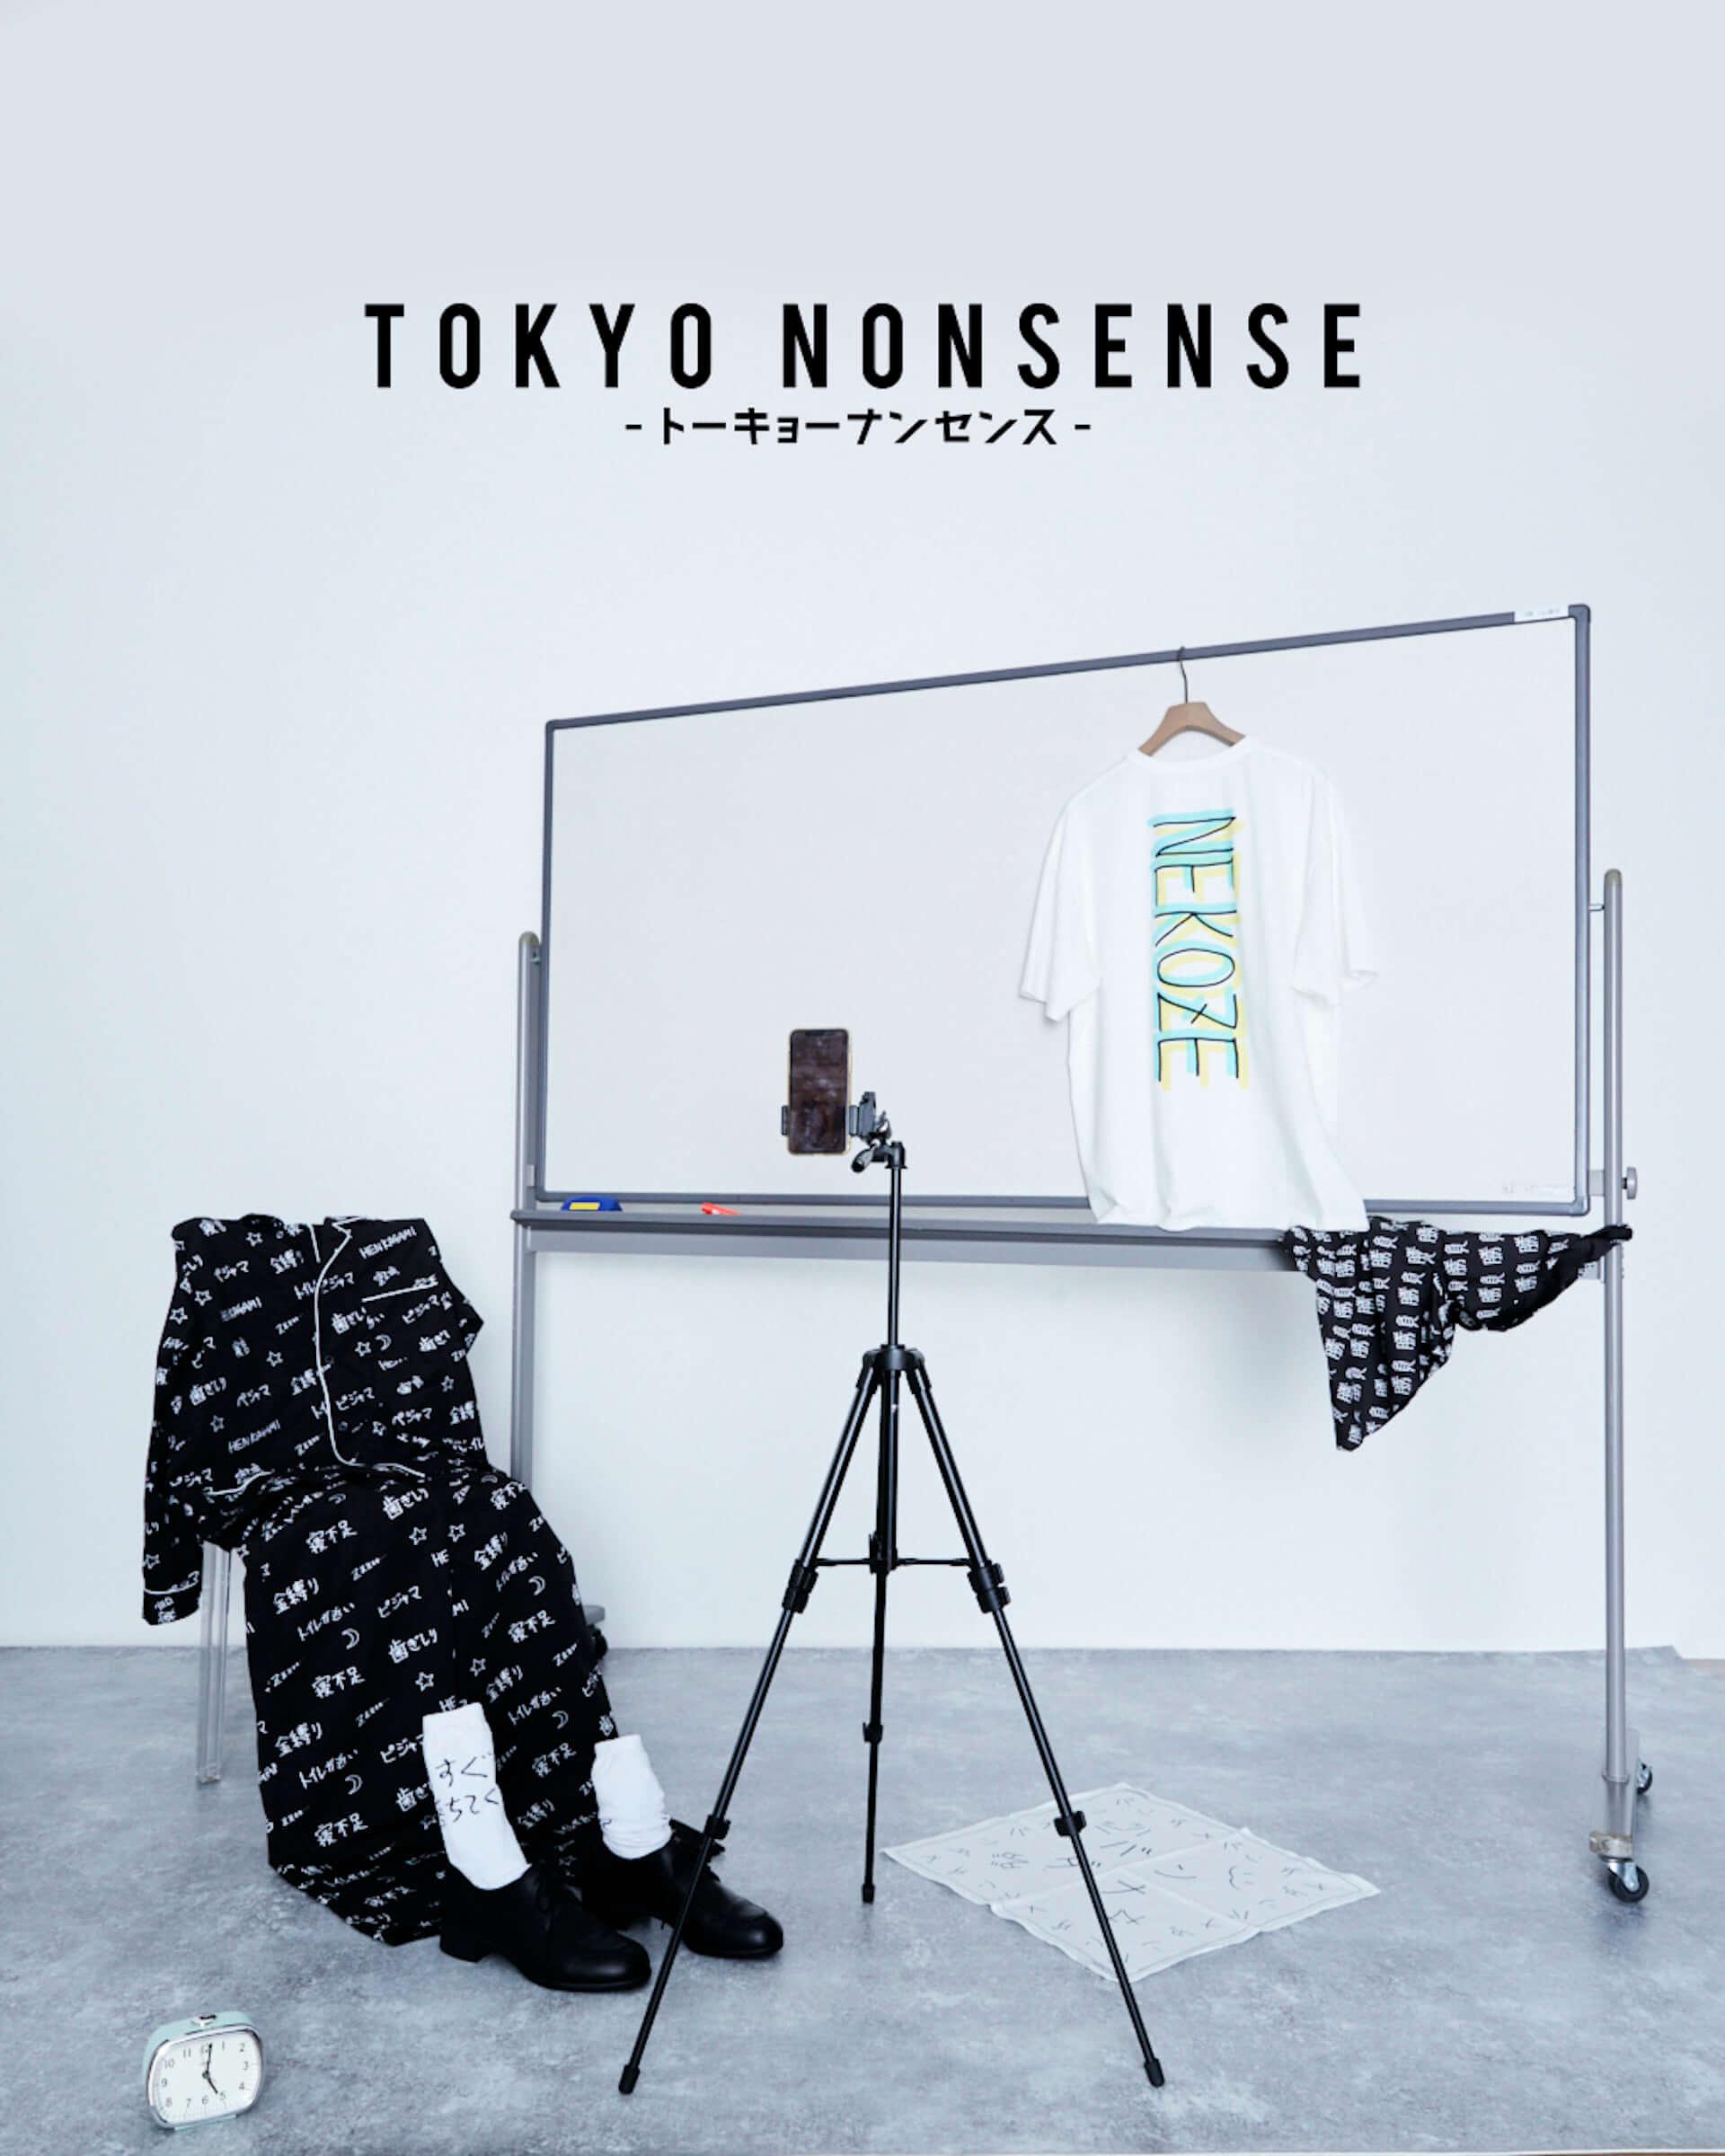 HARE×加賀美健の「TOKYO NONSENSE」第7弾コラボアイテムが販売決定!『勝負パンツ』『猫背T』等10点がラインナップ lf200730_tokyo-nonsense_1-1920x2400